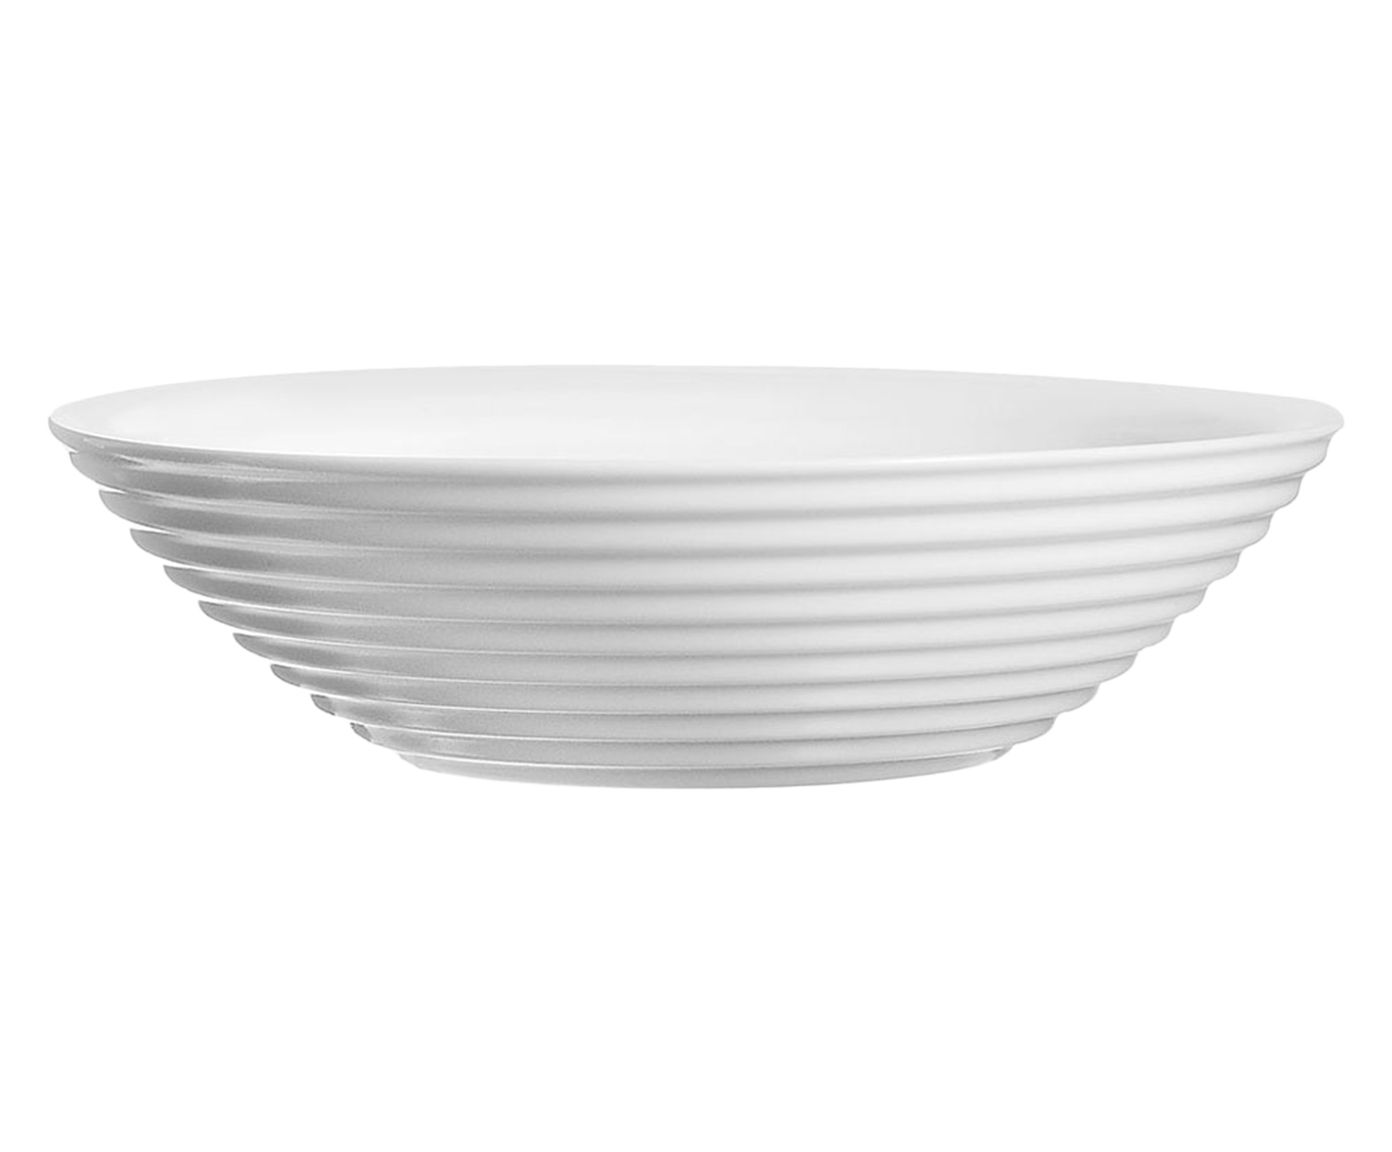 Bowl Harena Branco - 16X4,4cm   Westwing.com.br